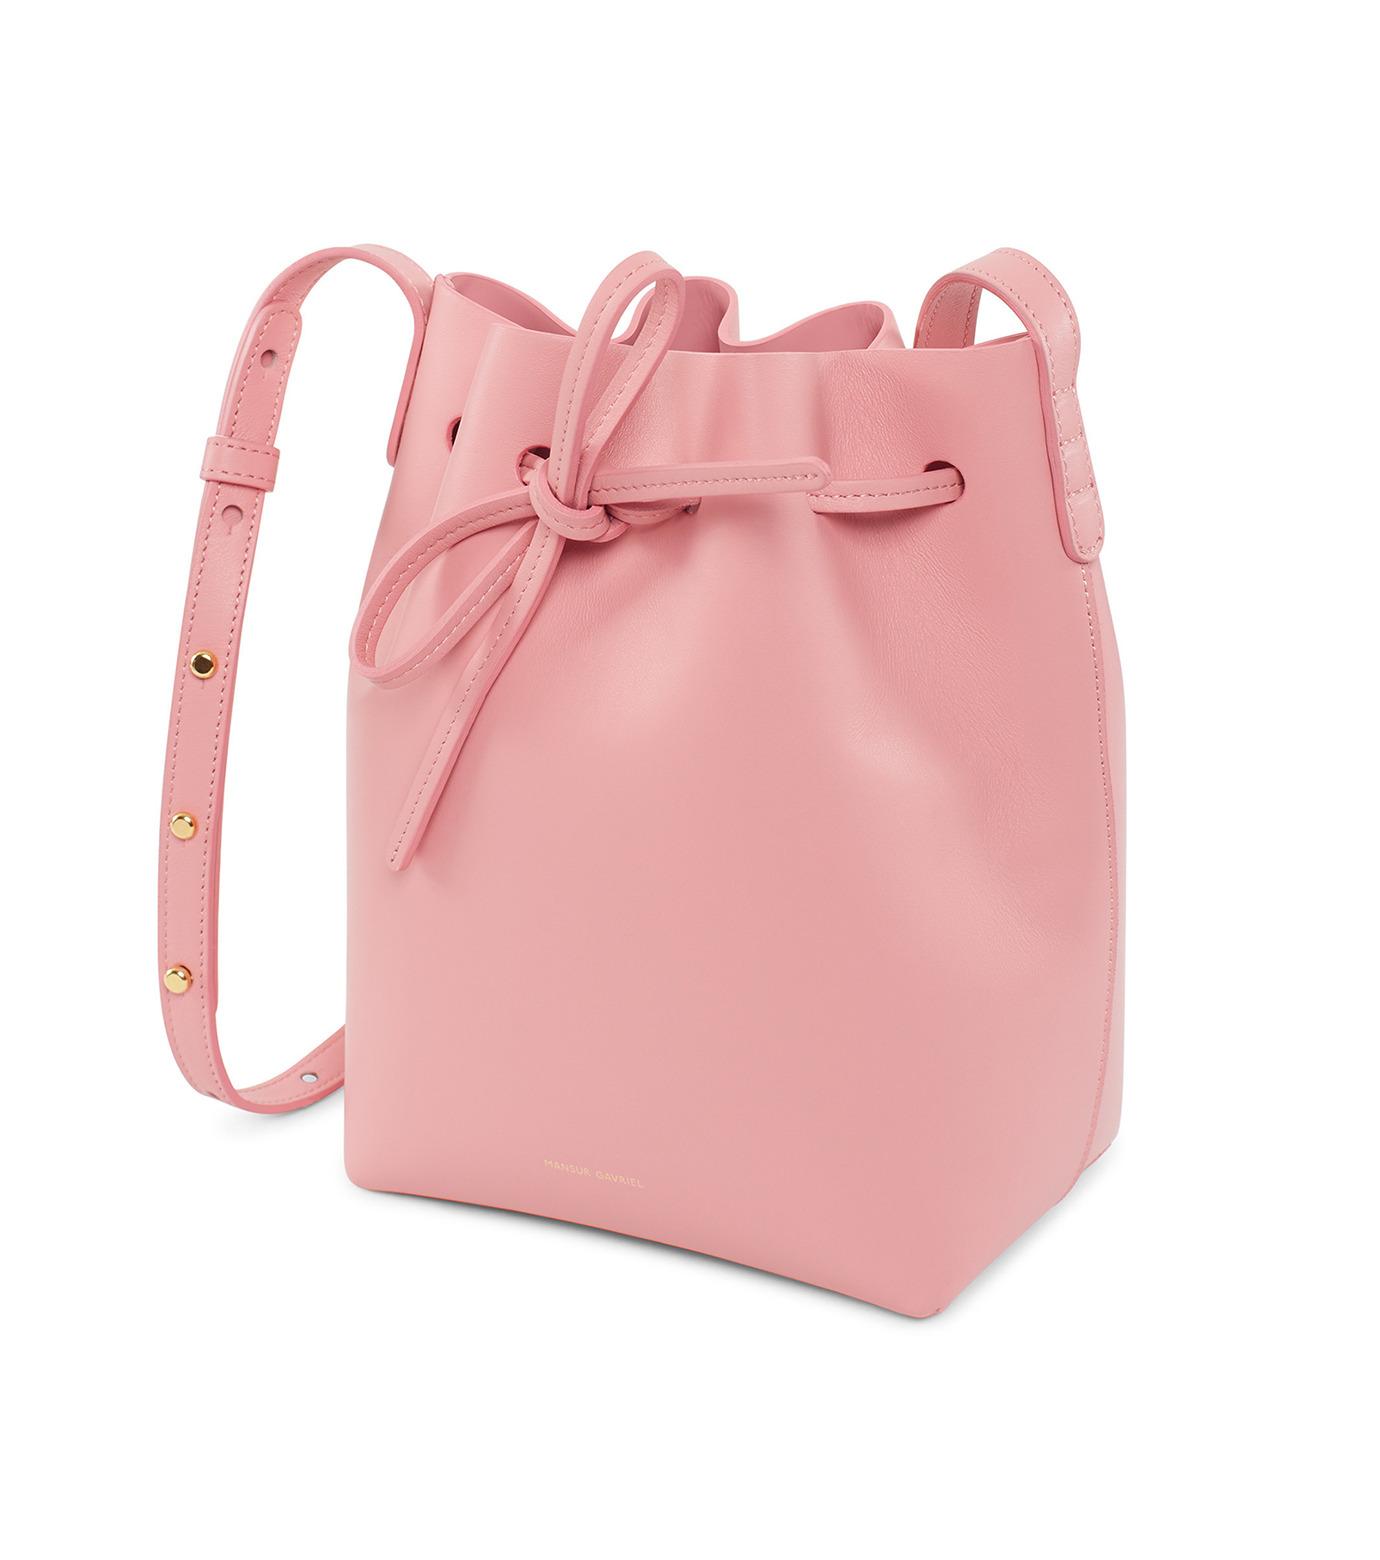 Mansur Gavriel(マンサーガブリエル)のMini Bucket Bag-PINK(バッグ/bag)-HMB004CA-72 拡大詳細画像2